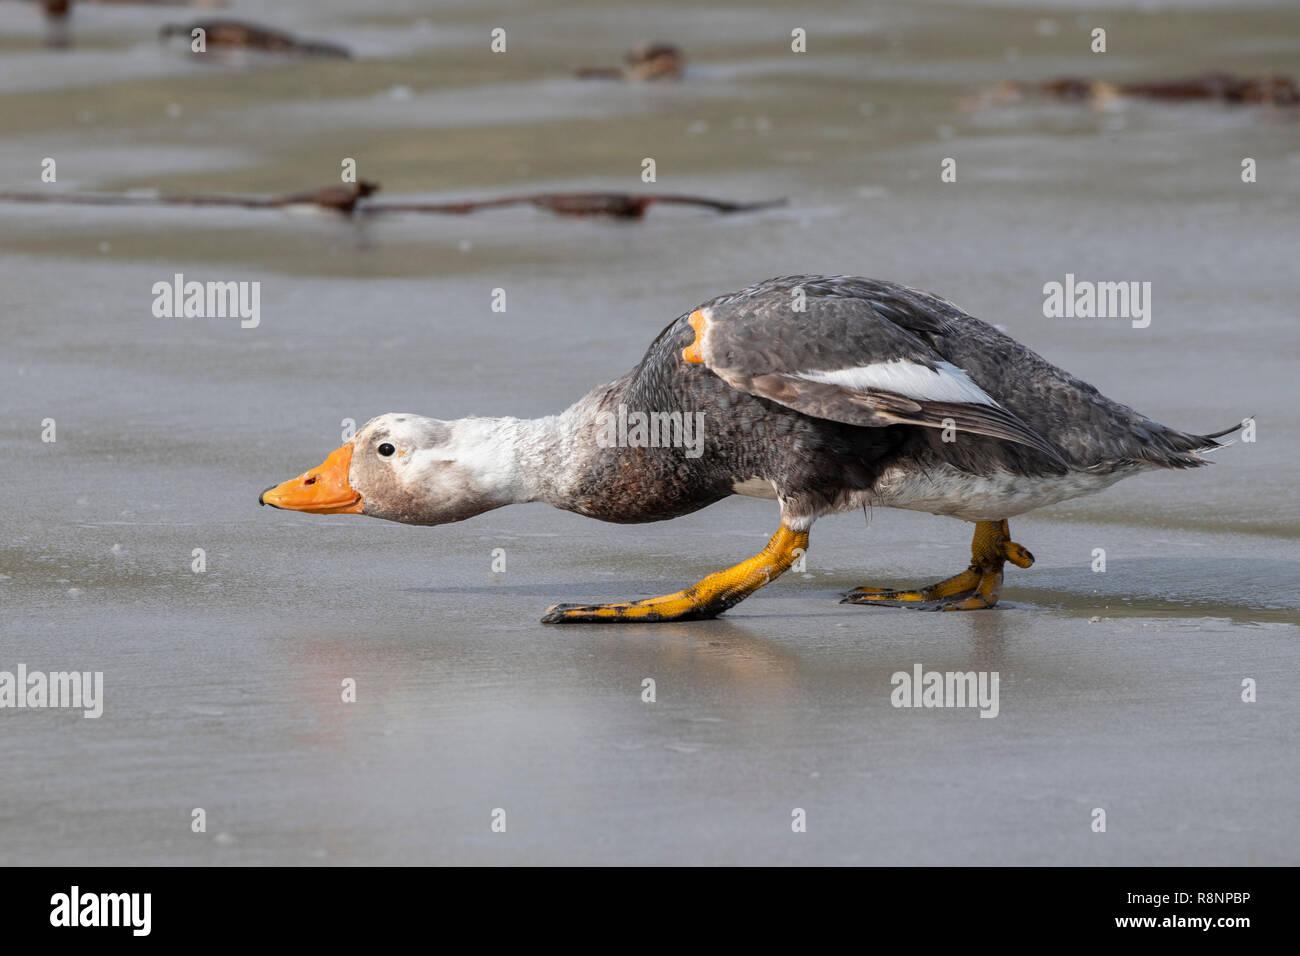 United Kingdom, Falkland Islands, West Falklands, Carcass Island. Adult Falkland flightless steamerduck (Tachyeres brachypterus) 'sneaking' around the - Stock Image